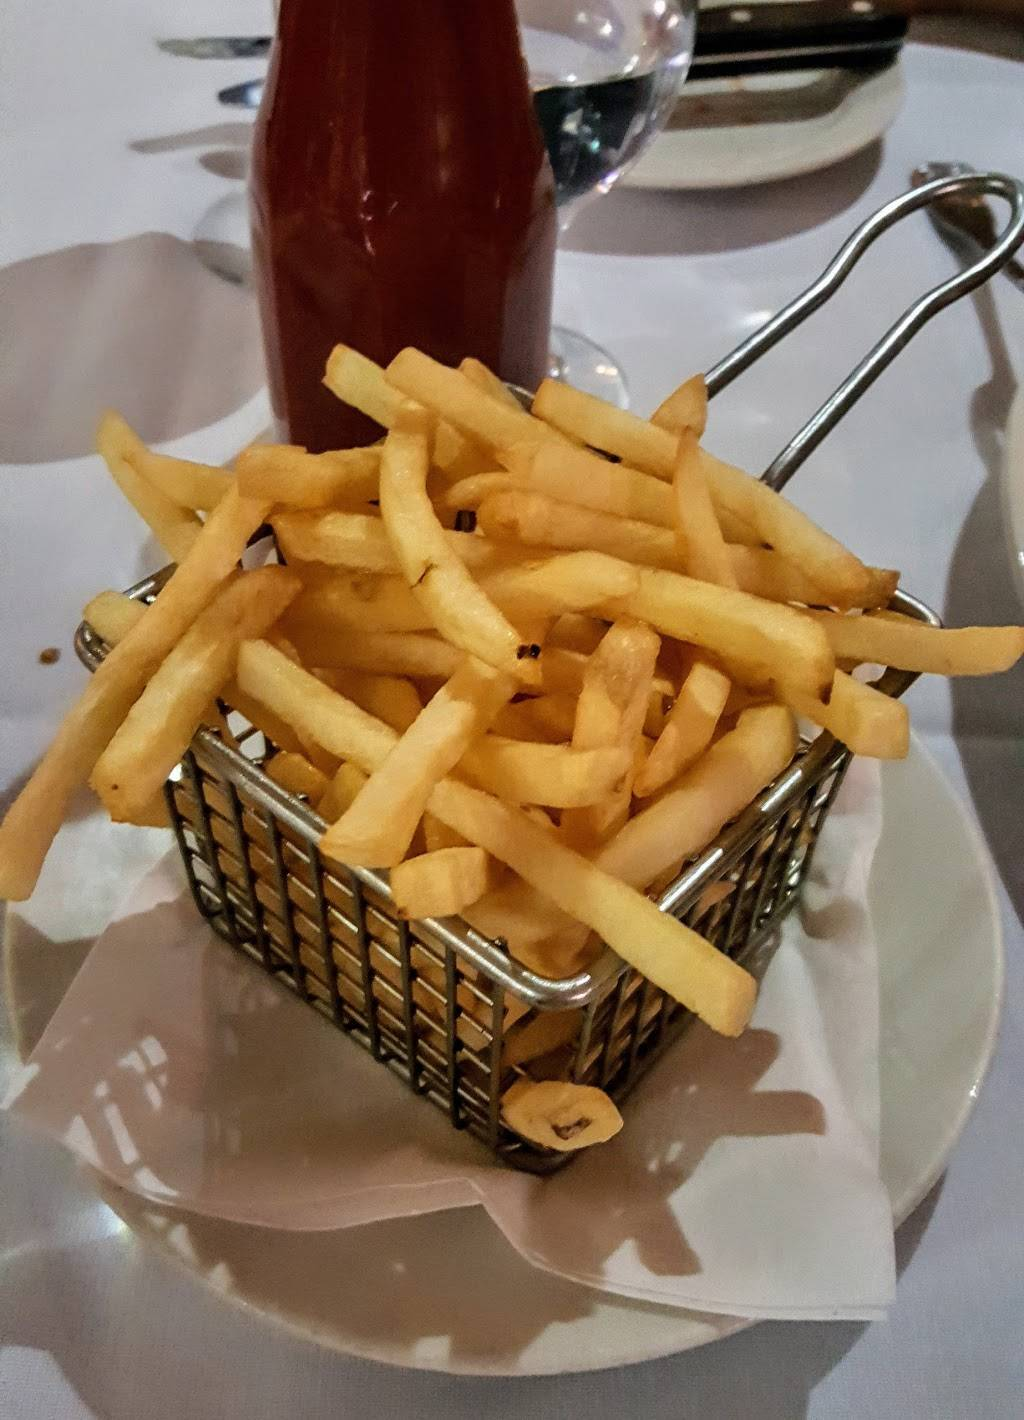 La Fusta NJ | restaurant | 1110 Tonnelle Ave, North Bergen, NJ 07047, USA | 2017701950 OR +1 201-770-1950